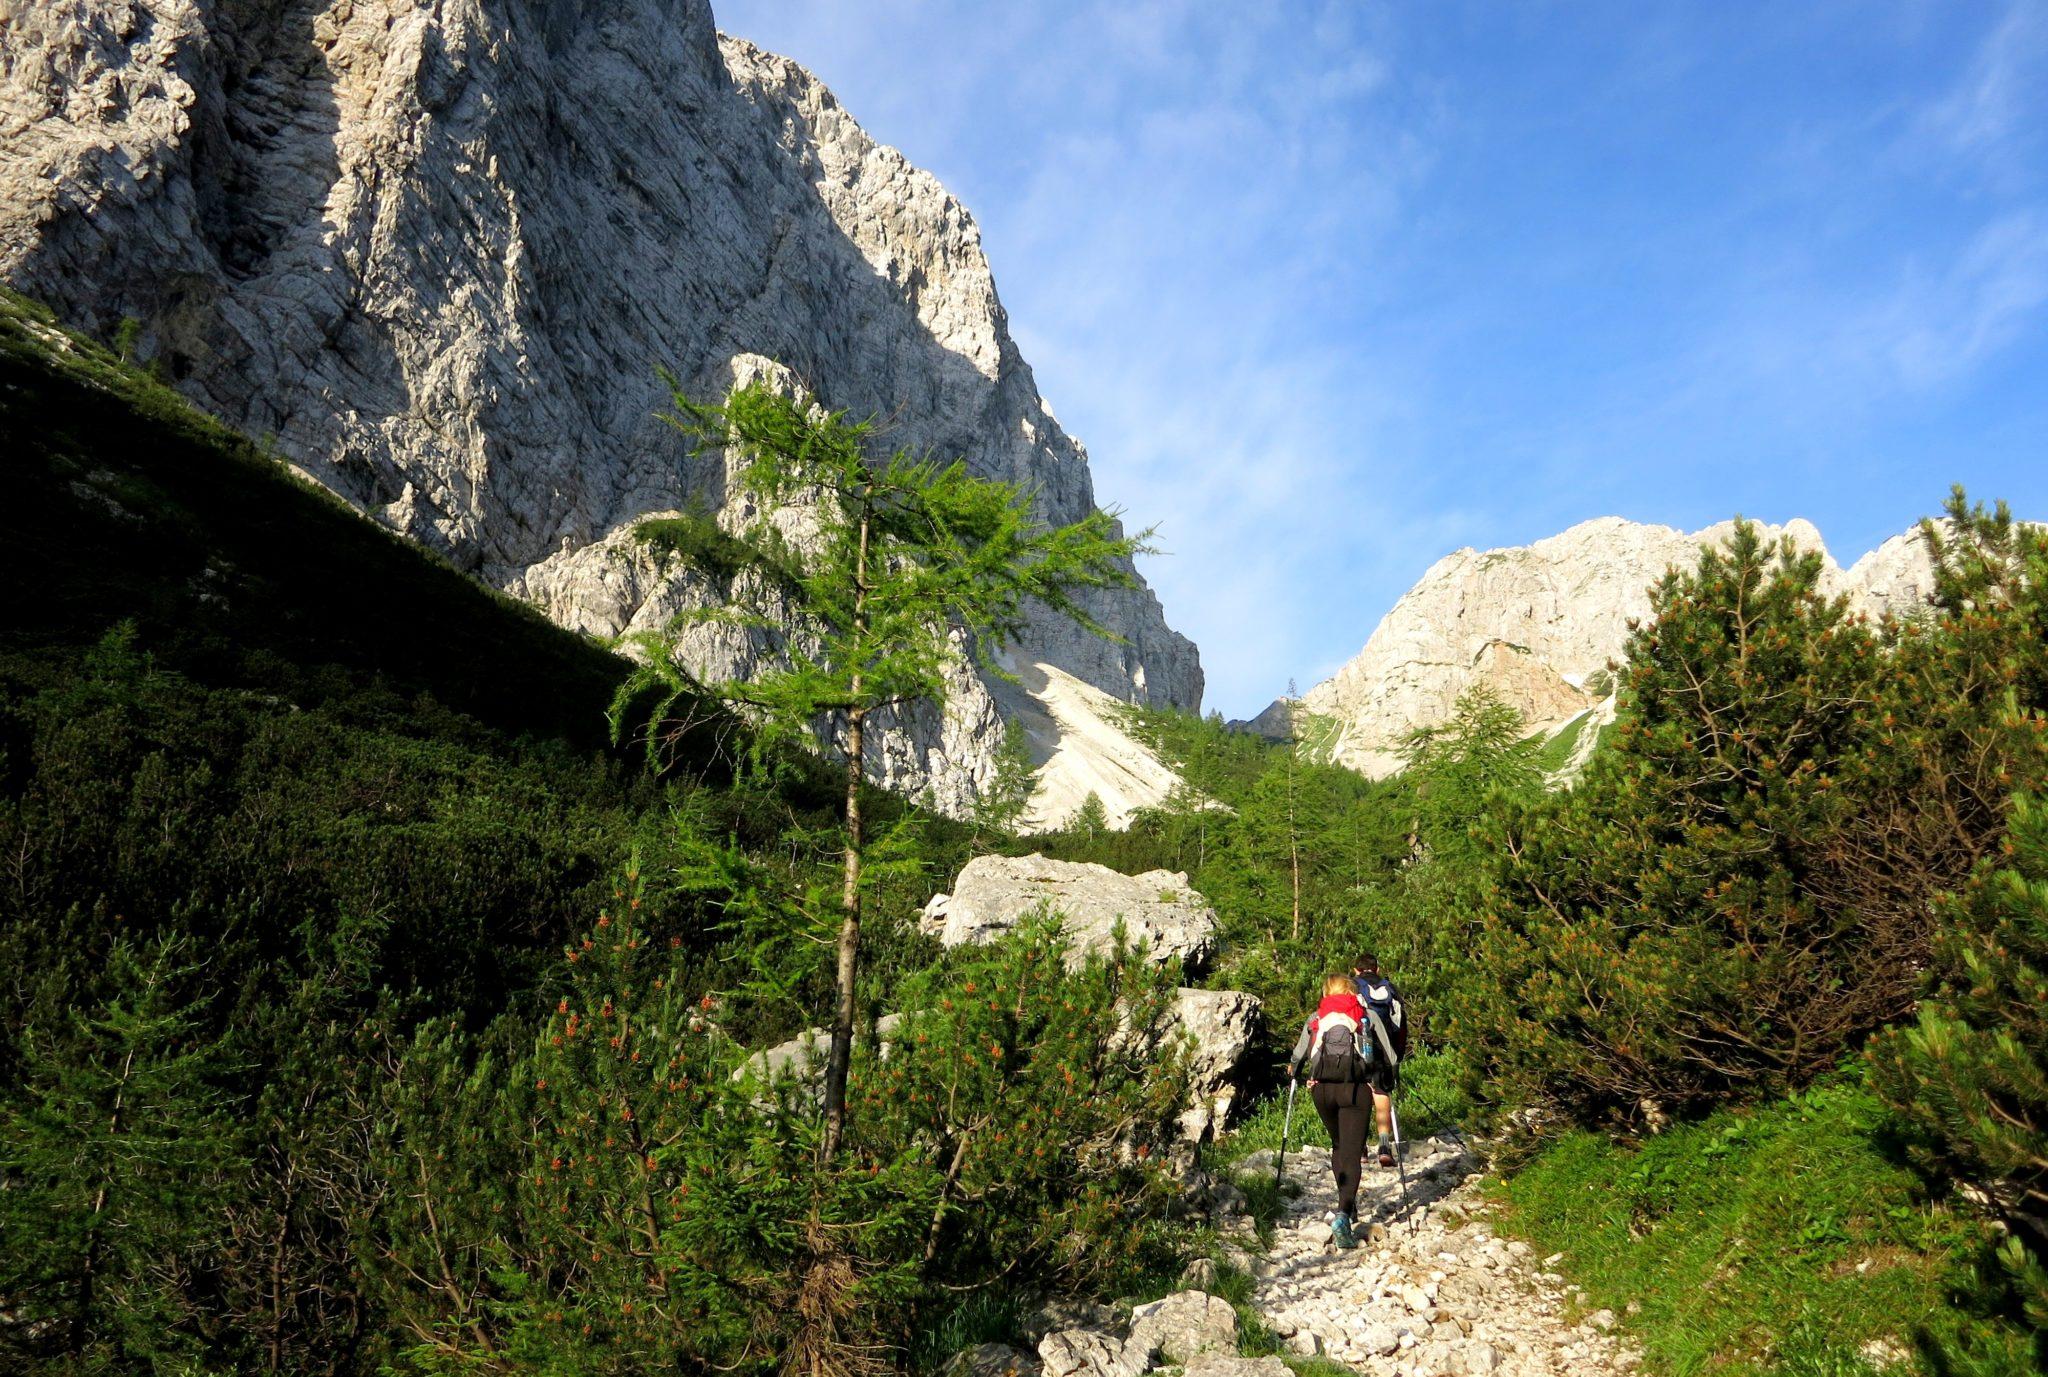 Climbing Triglav from the Krma valley